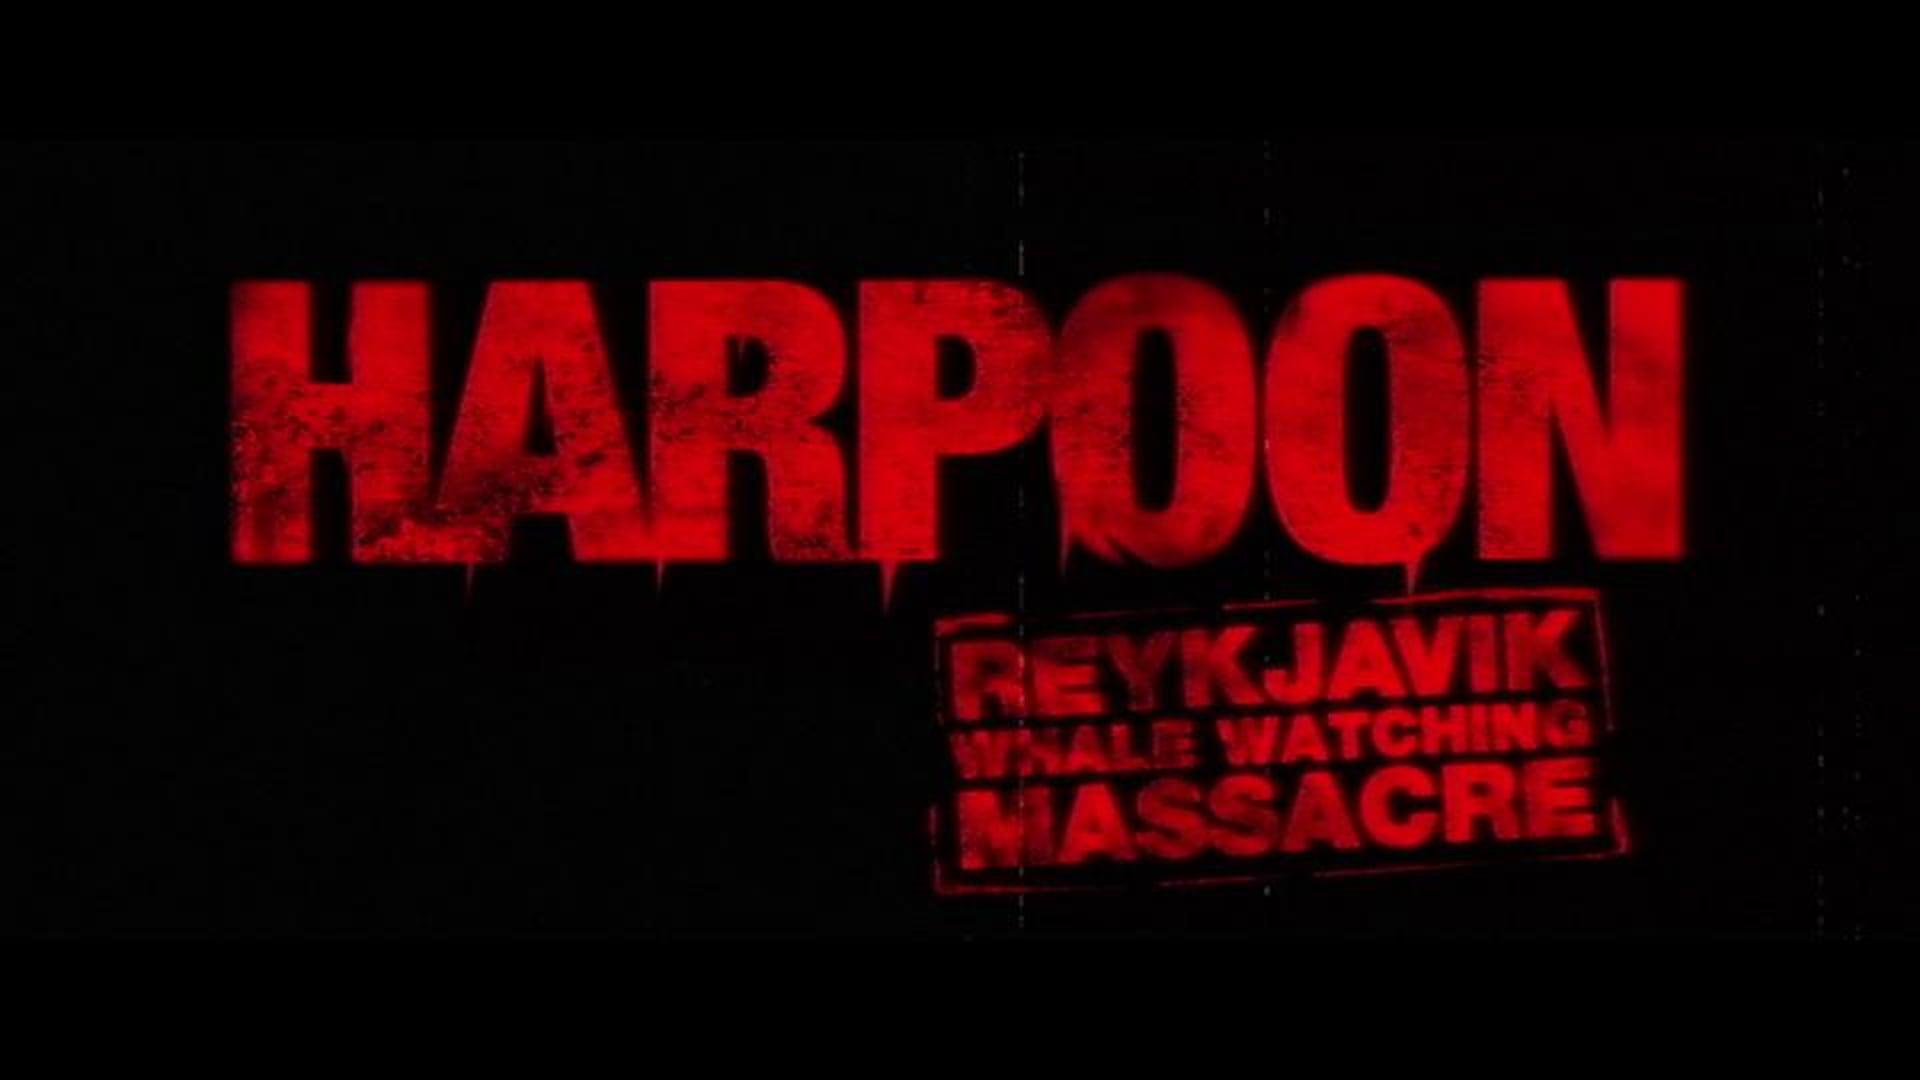 HARPOON - Reykjavik Whale Watching Massacre